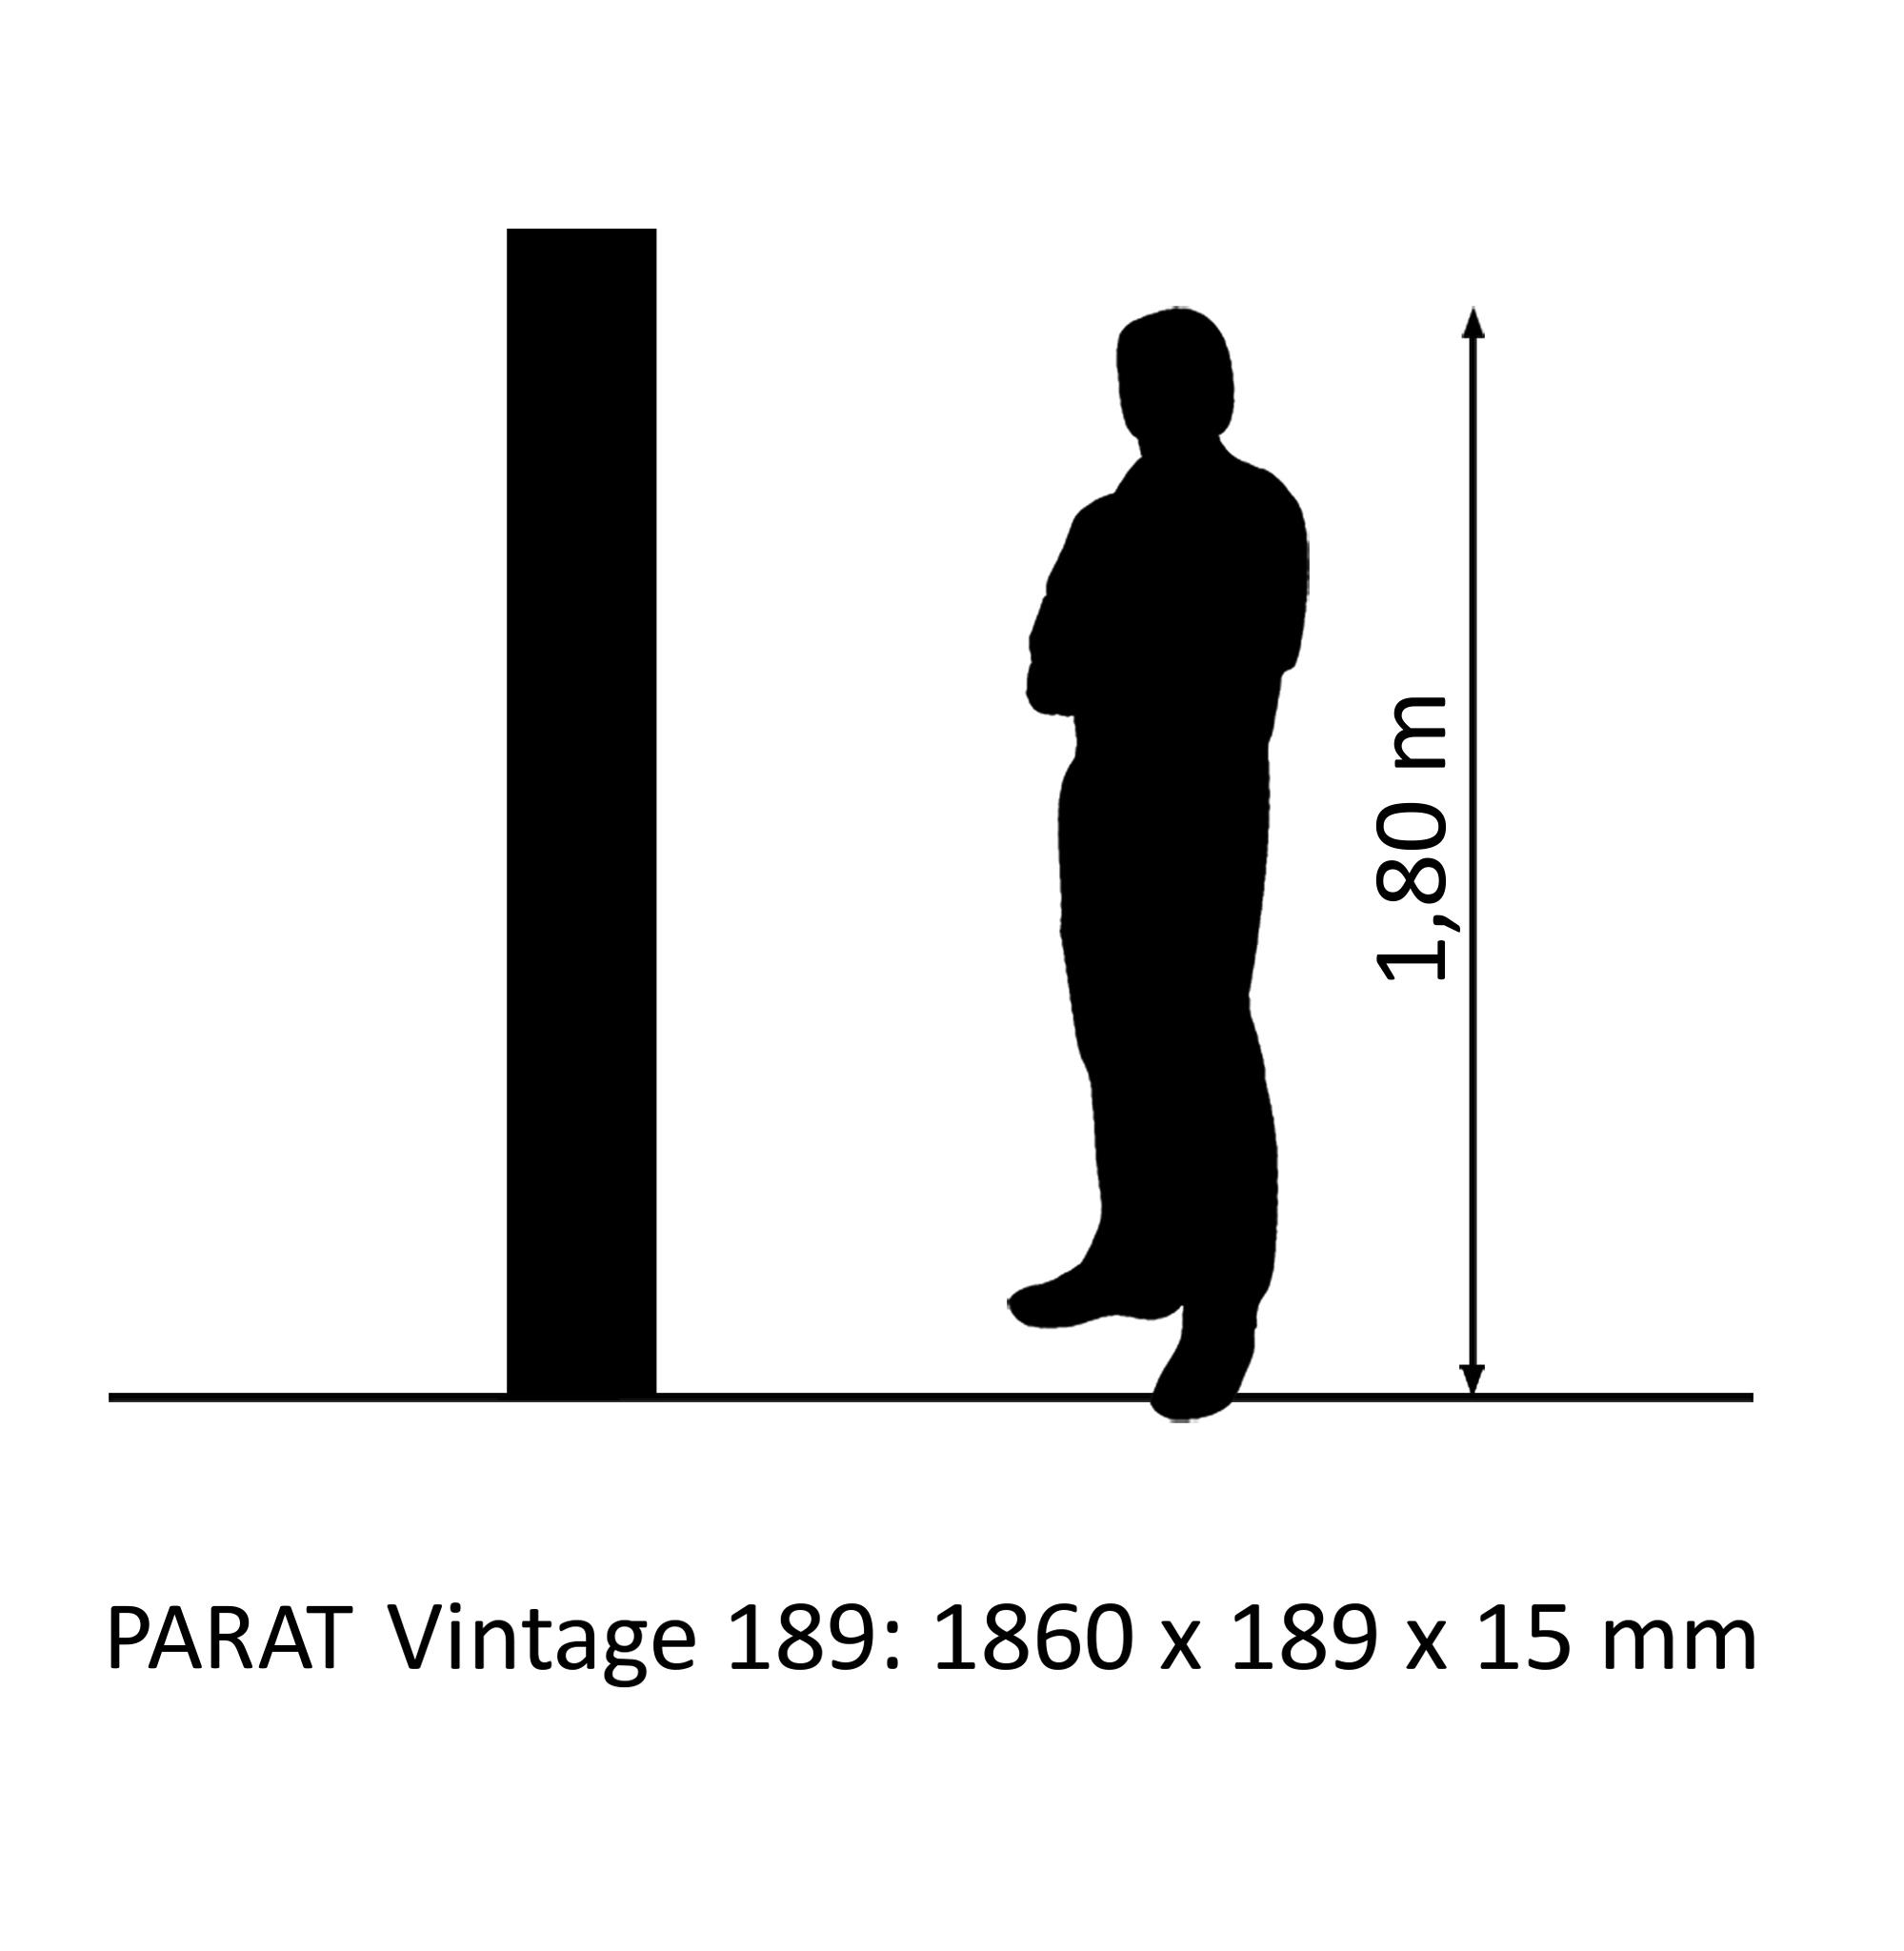 PARAT Vintage 189 larch rustic 1-strip